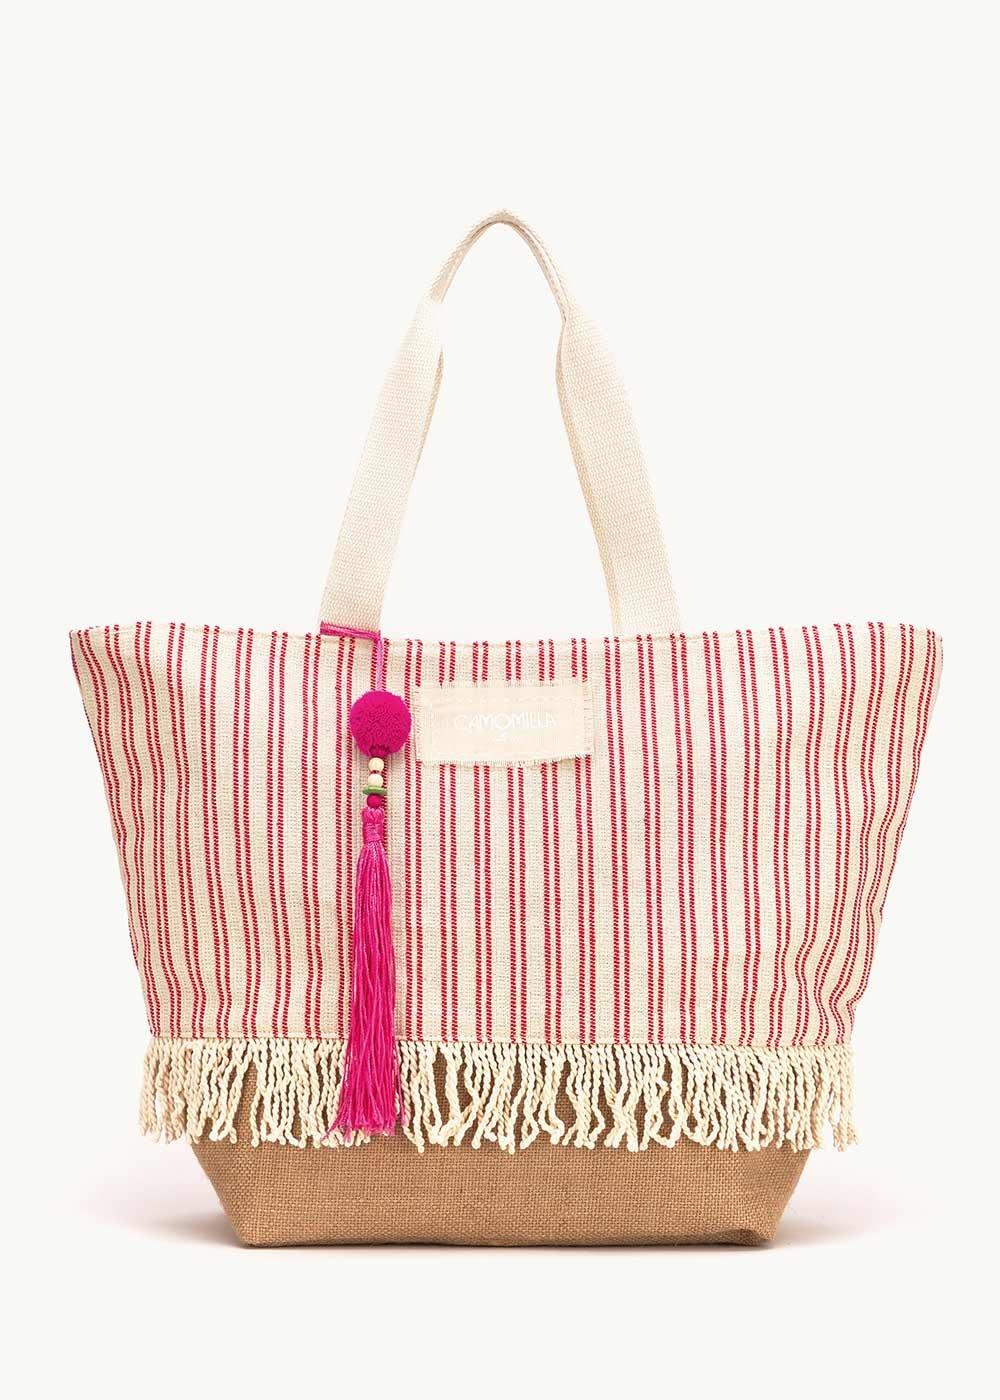 Barth bag with striped pattern - White / Aragosta Stripes - Woman